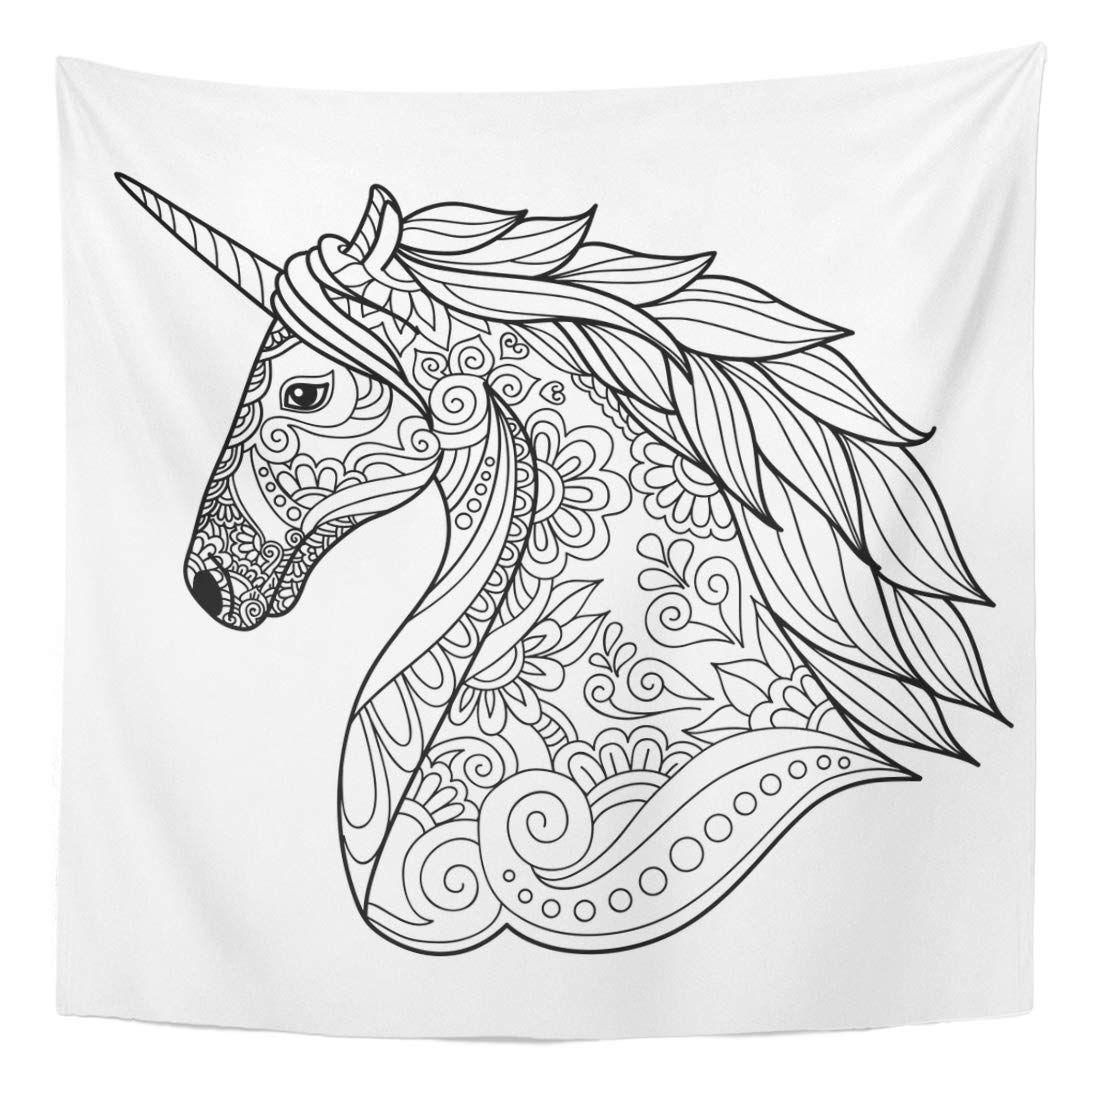 Drawing Unicorn Zentangle For Coloring Book Tattoo Sign Wall Art Hanging Tapestry 60x80 Inch Dibujos Para Colorear Adultos Dibujos De Unicornios Arte De Unicornio [ 1100 x 1100 Pixel ]